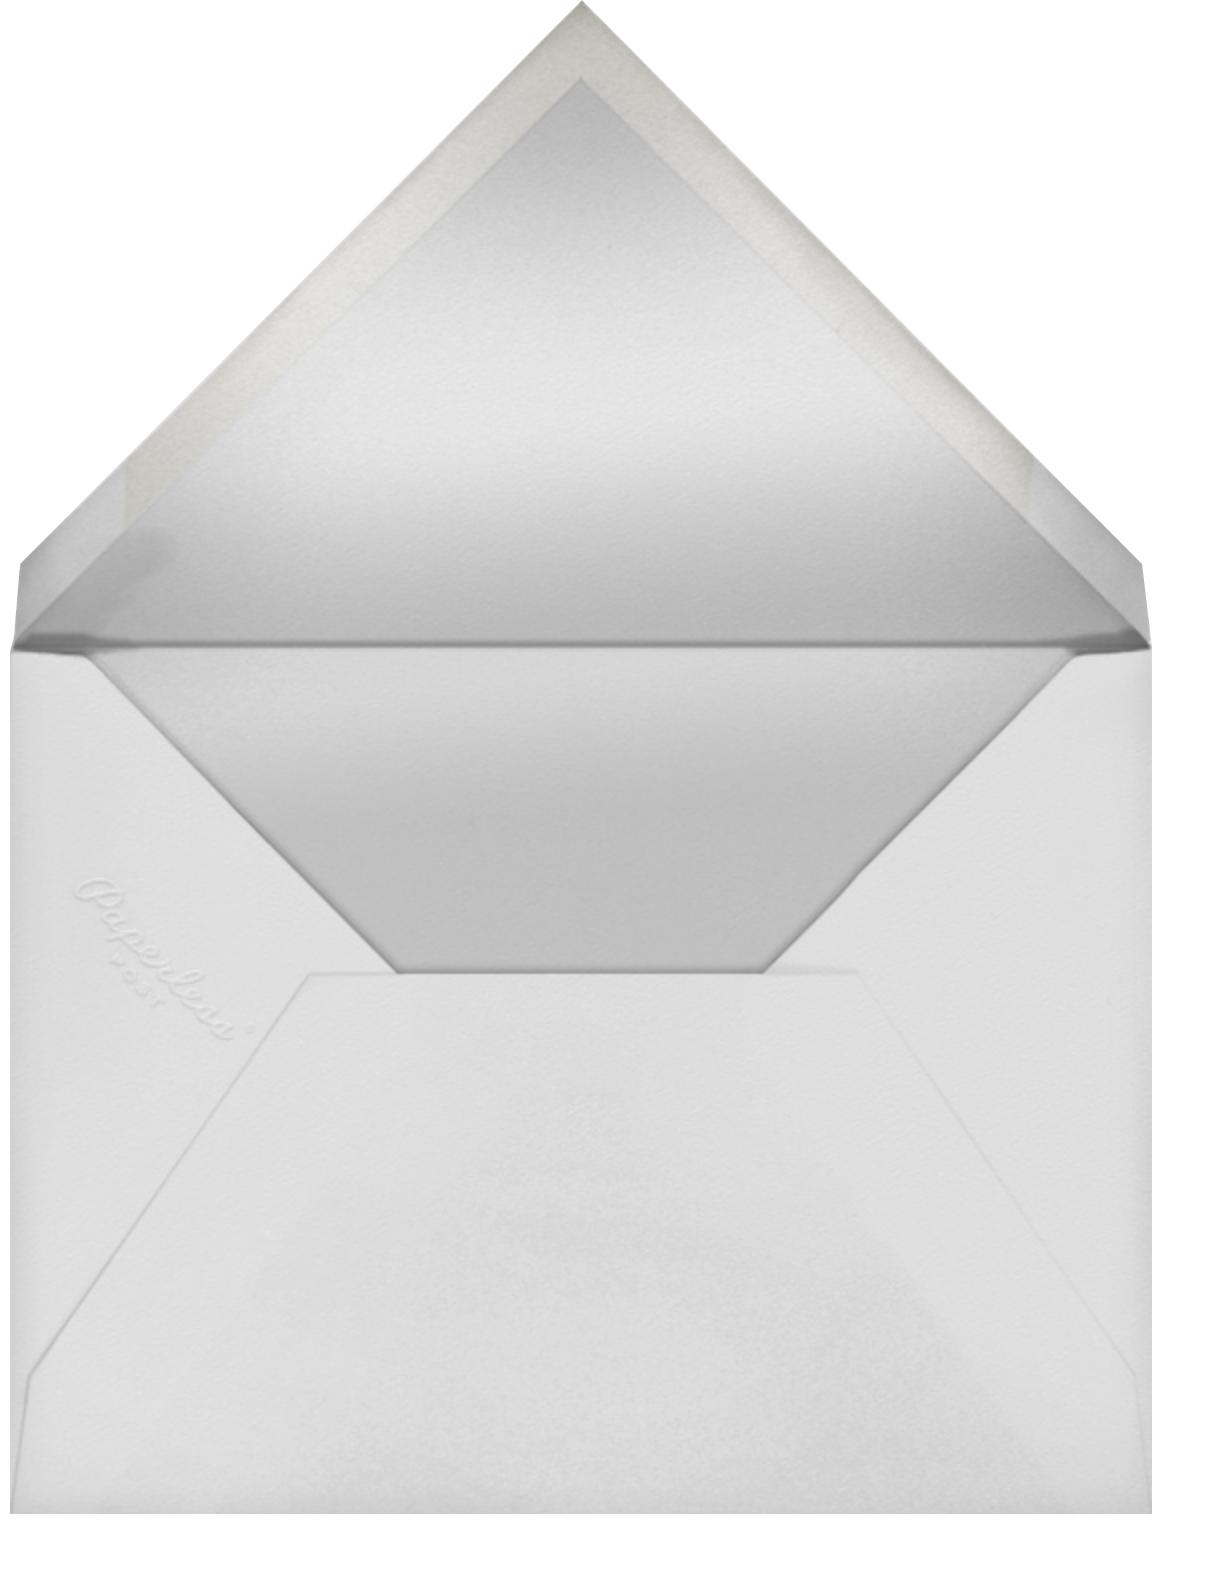 Palmier II (Menu) - Caribbean - Paperless Post - Menus - envelope back